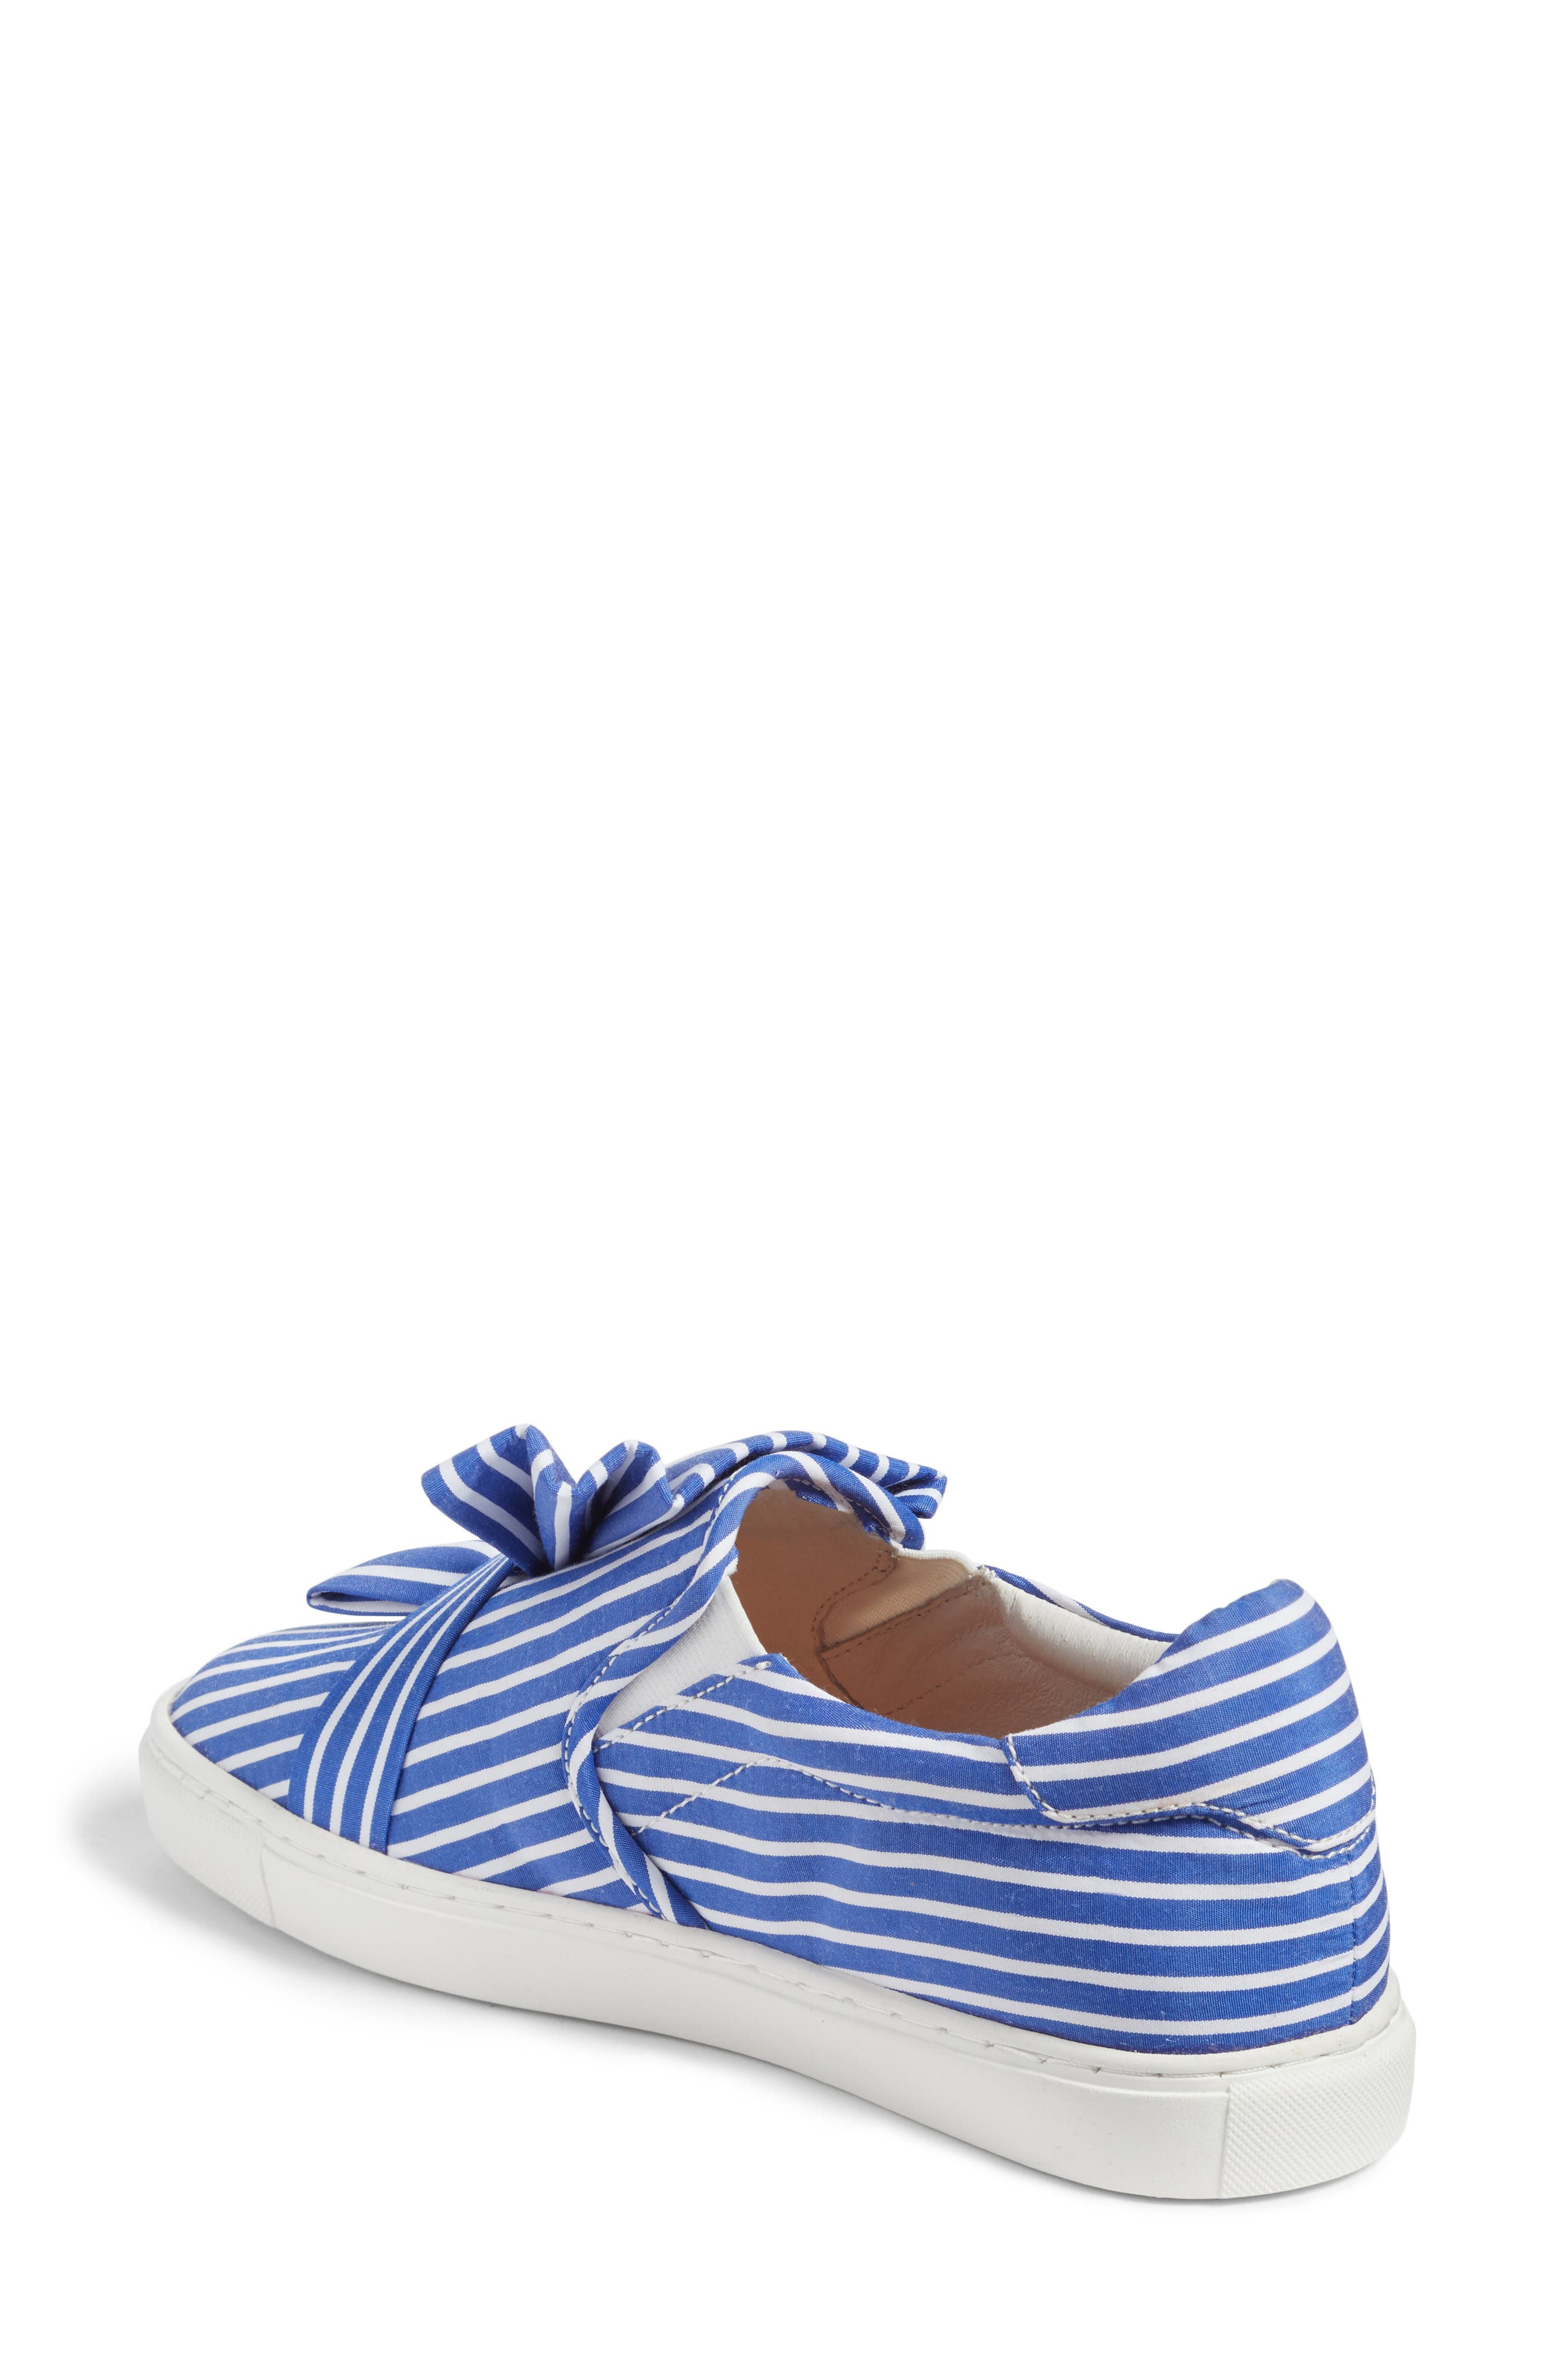 Mika Slip-On Sneaker,                             Alternate thumbnail 3, color,                             Blue Shirting Fabric